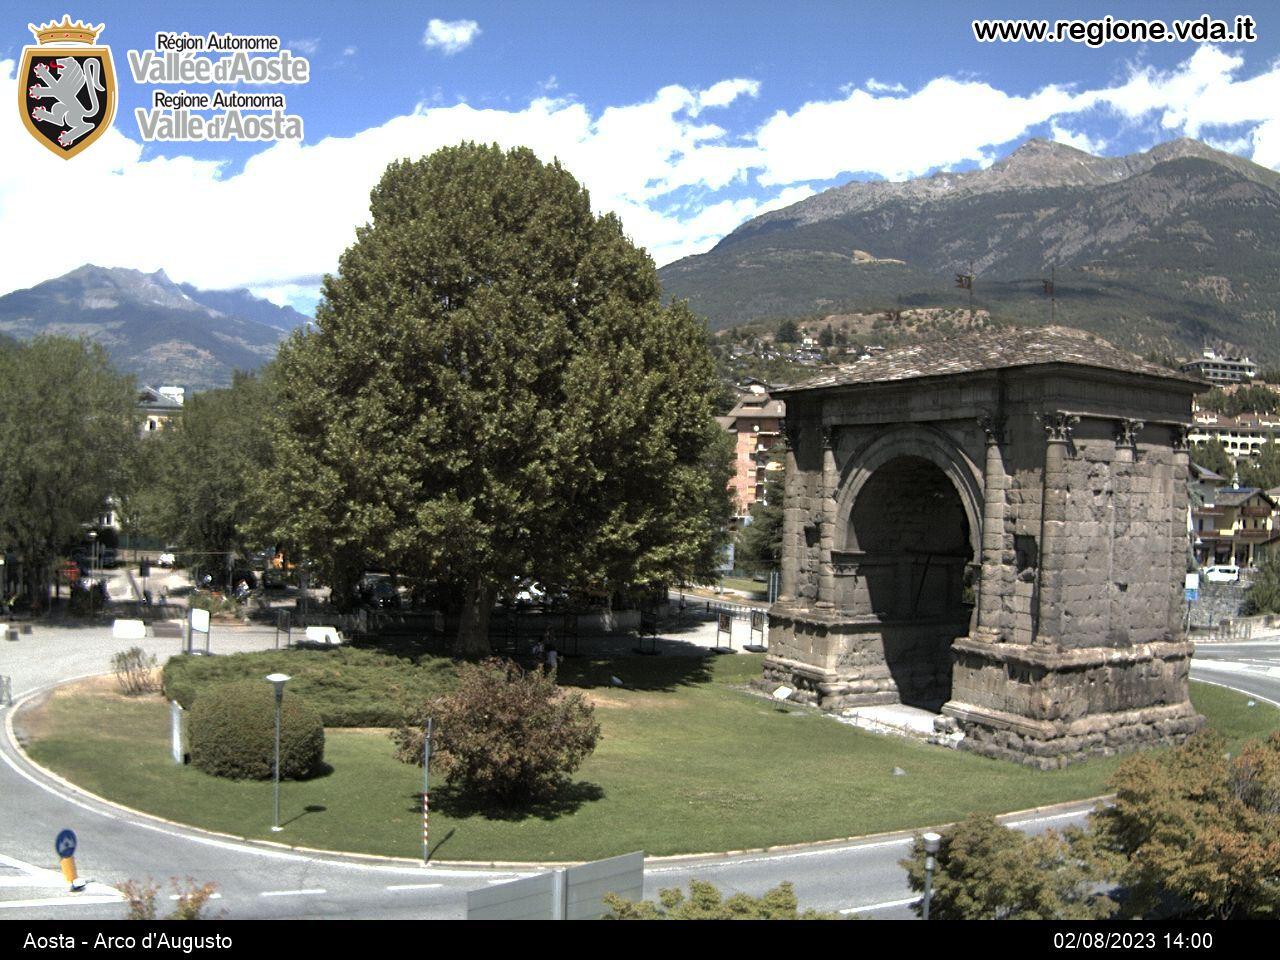 Aosta Arco di Augusto